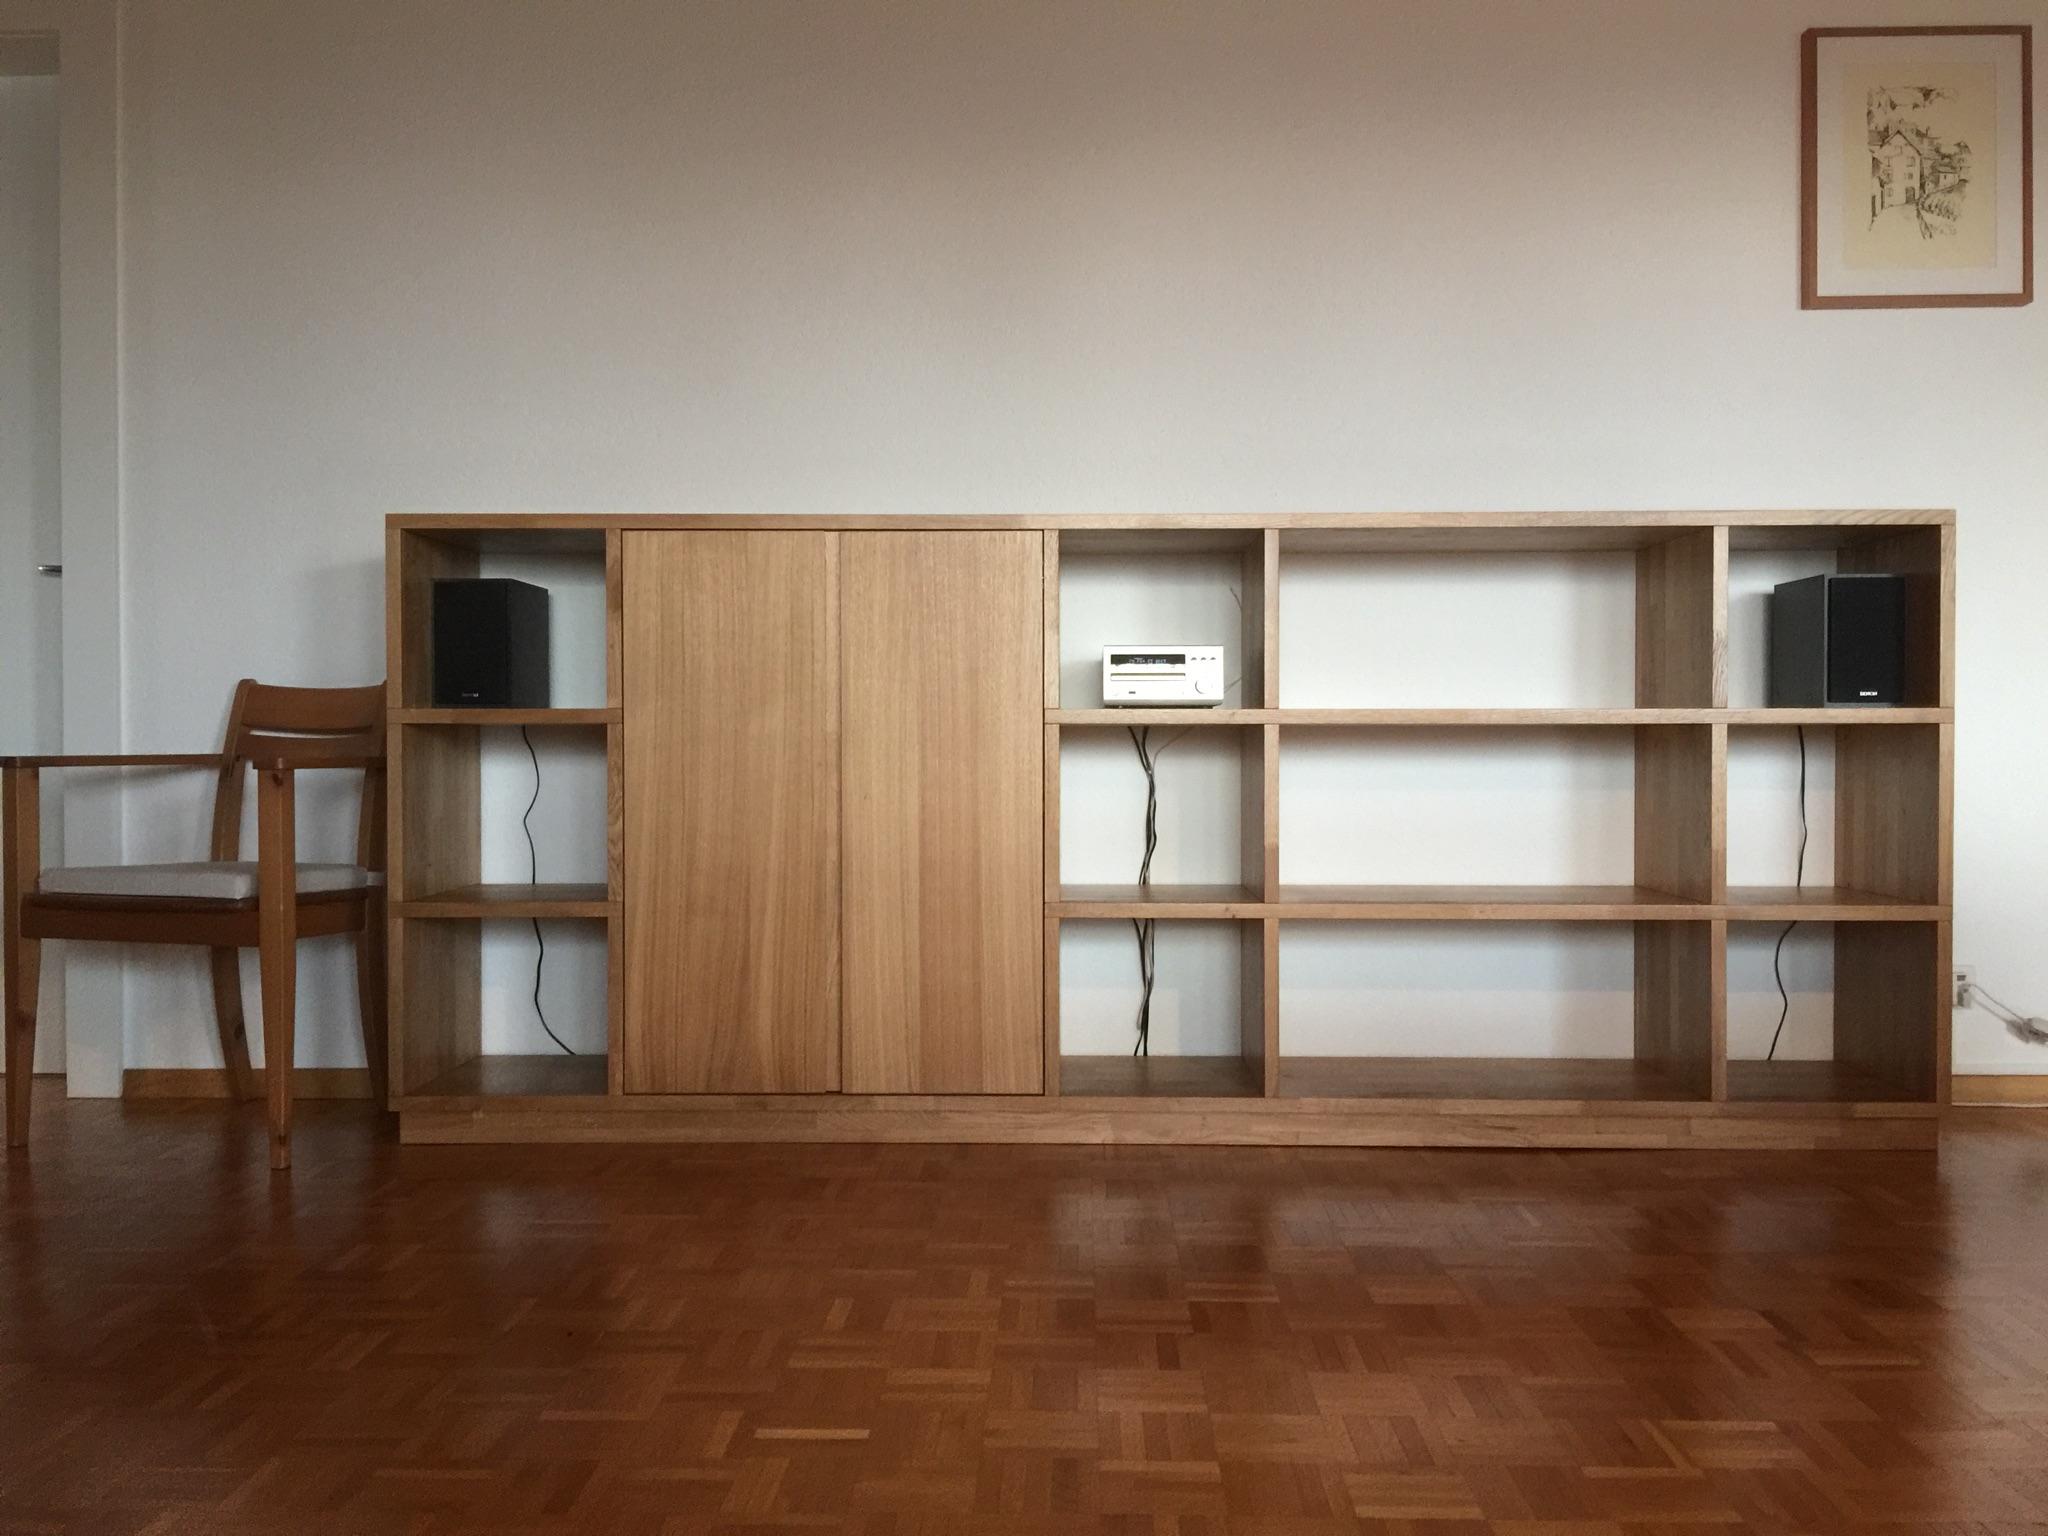 bibliotheque basse pour sono ap design